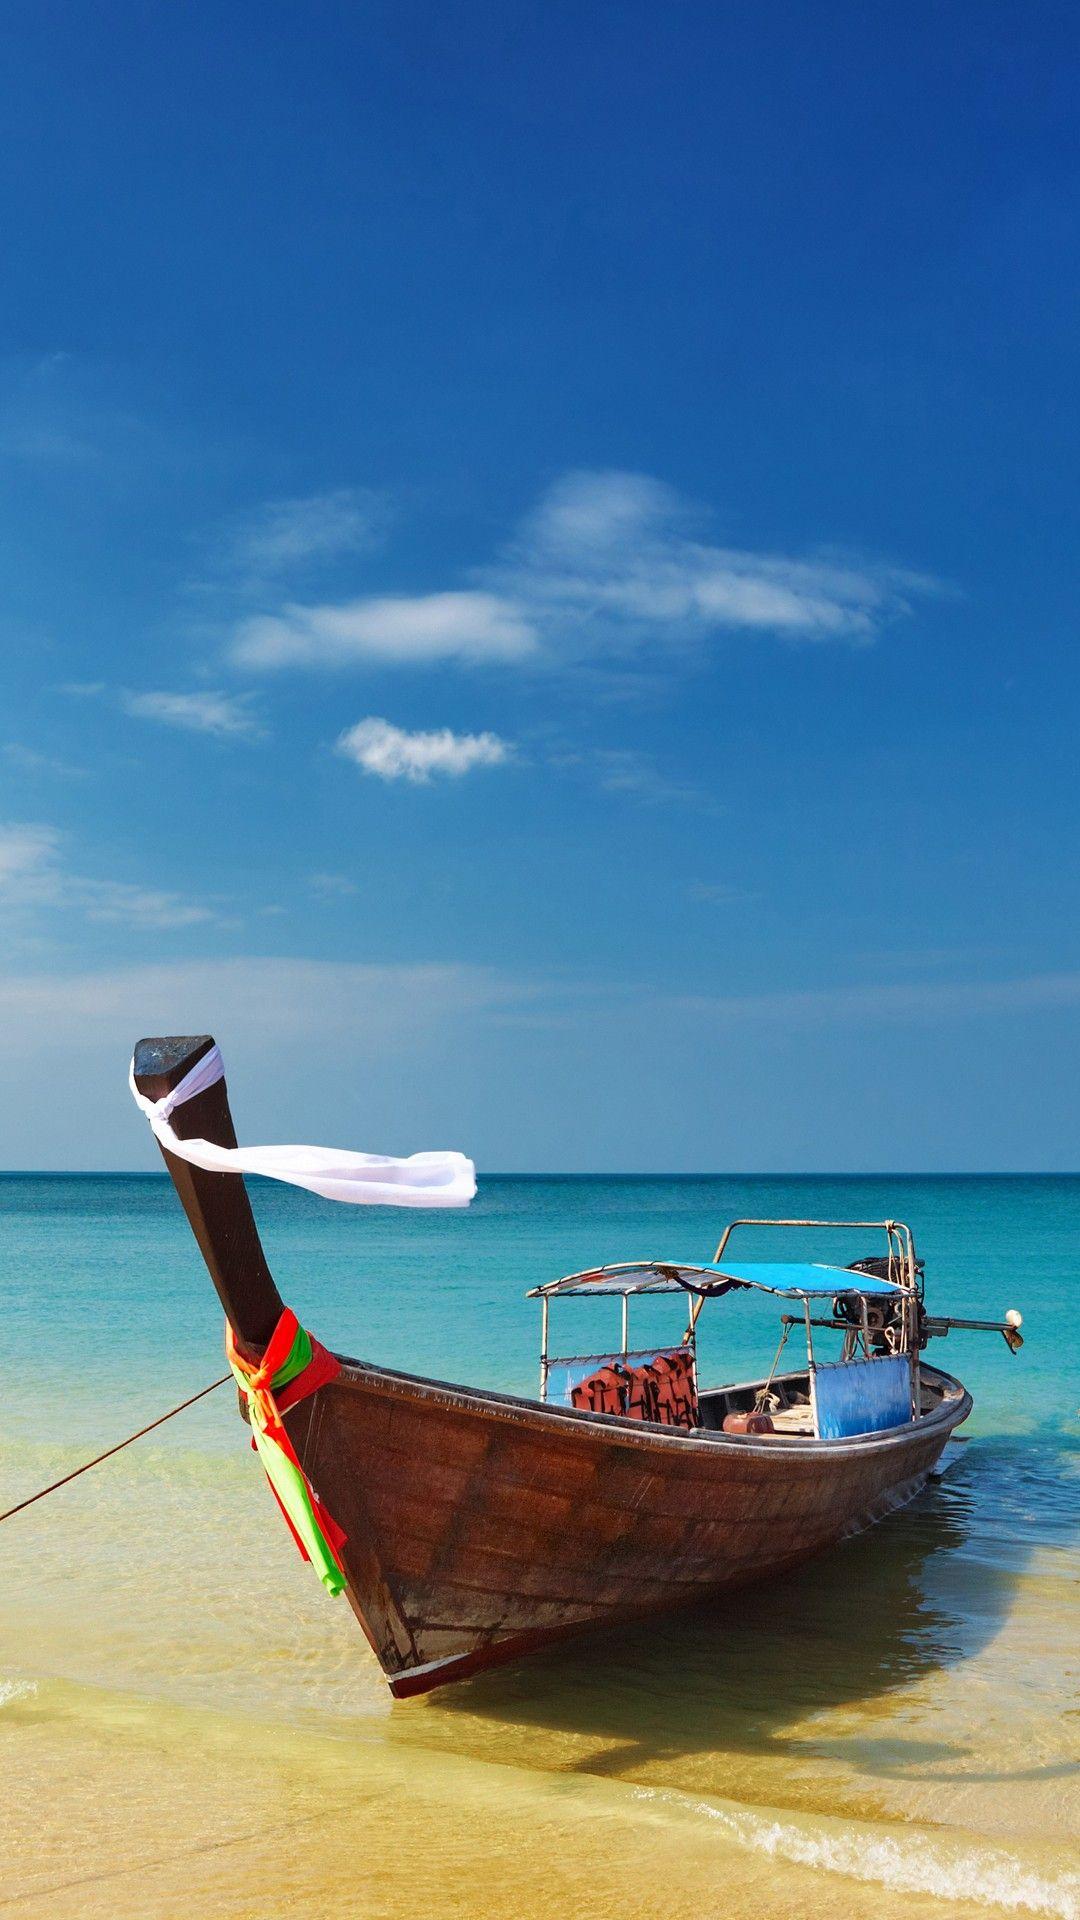 Thailand Beach Shore Boat Smartphone Wallpaper Hd Check More At Https Phonewallp Com Thailand Beach Shore Boat Smartphone Wallpaper Hd